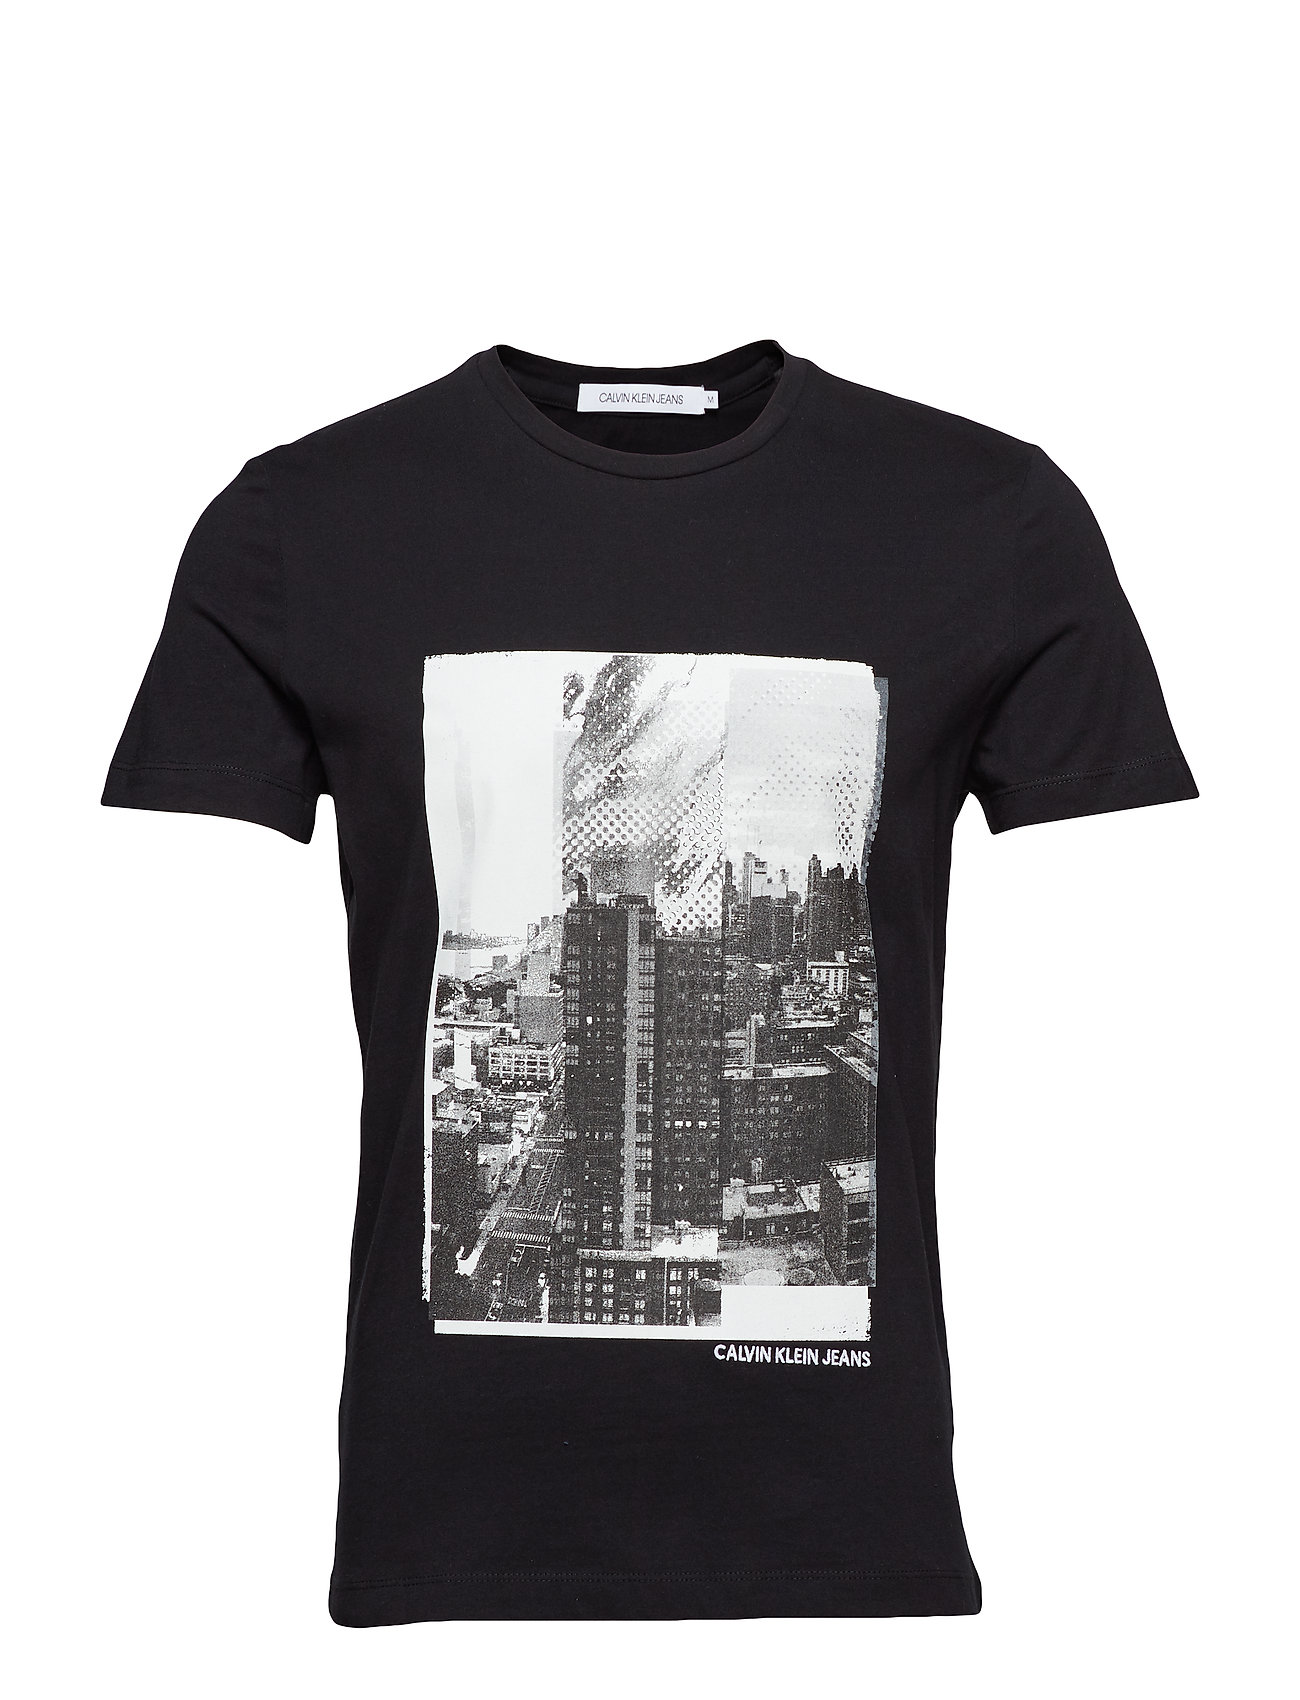 Calvin Klein Jeans LANDSCAPE GRAPHIC SL - CK BLACK / WHITE